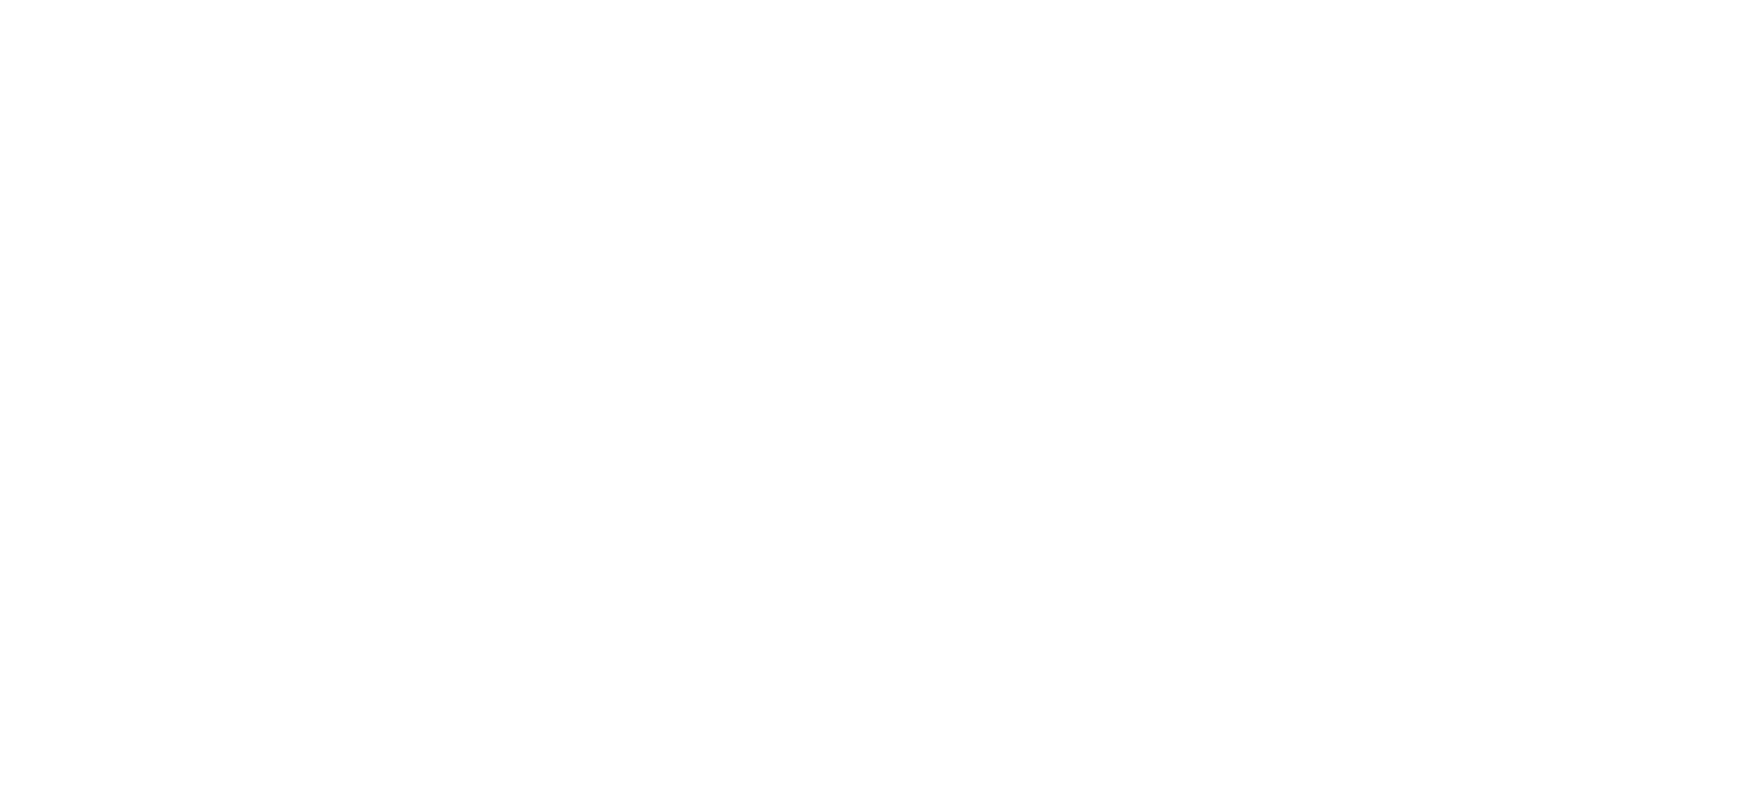 Vobisrent